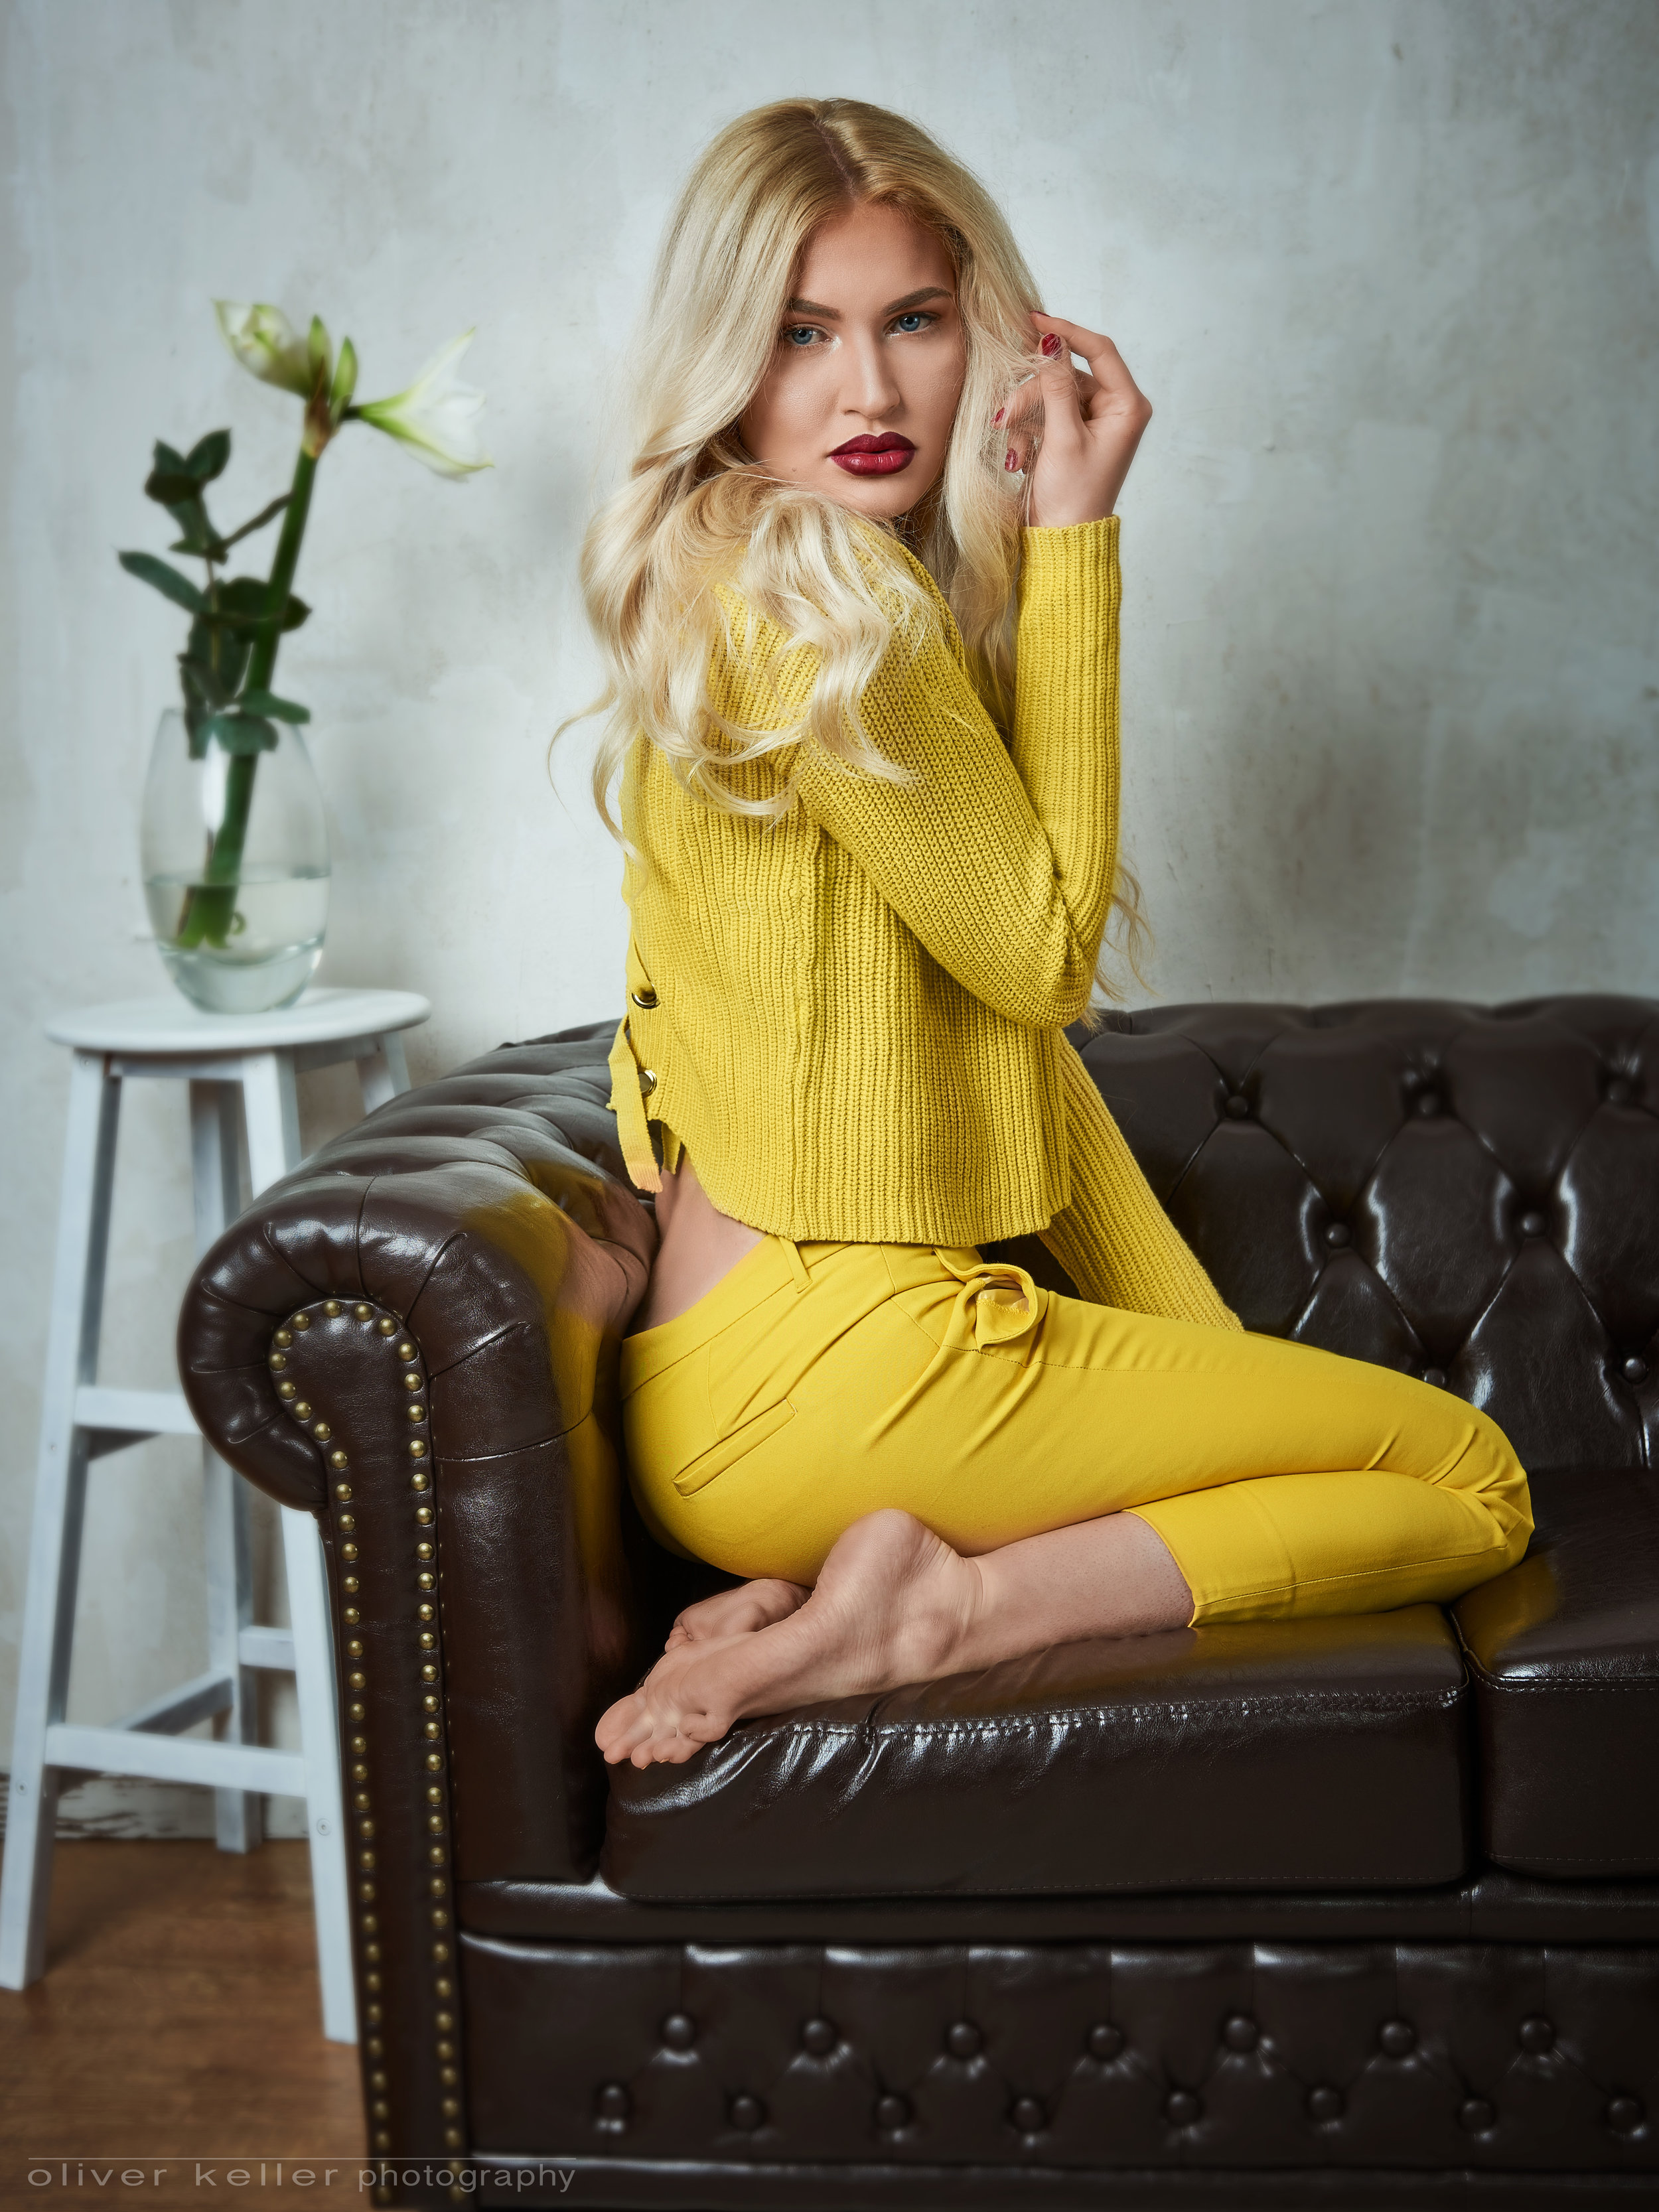 2016-11-11-yellow-fashion16403.jpg